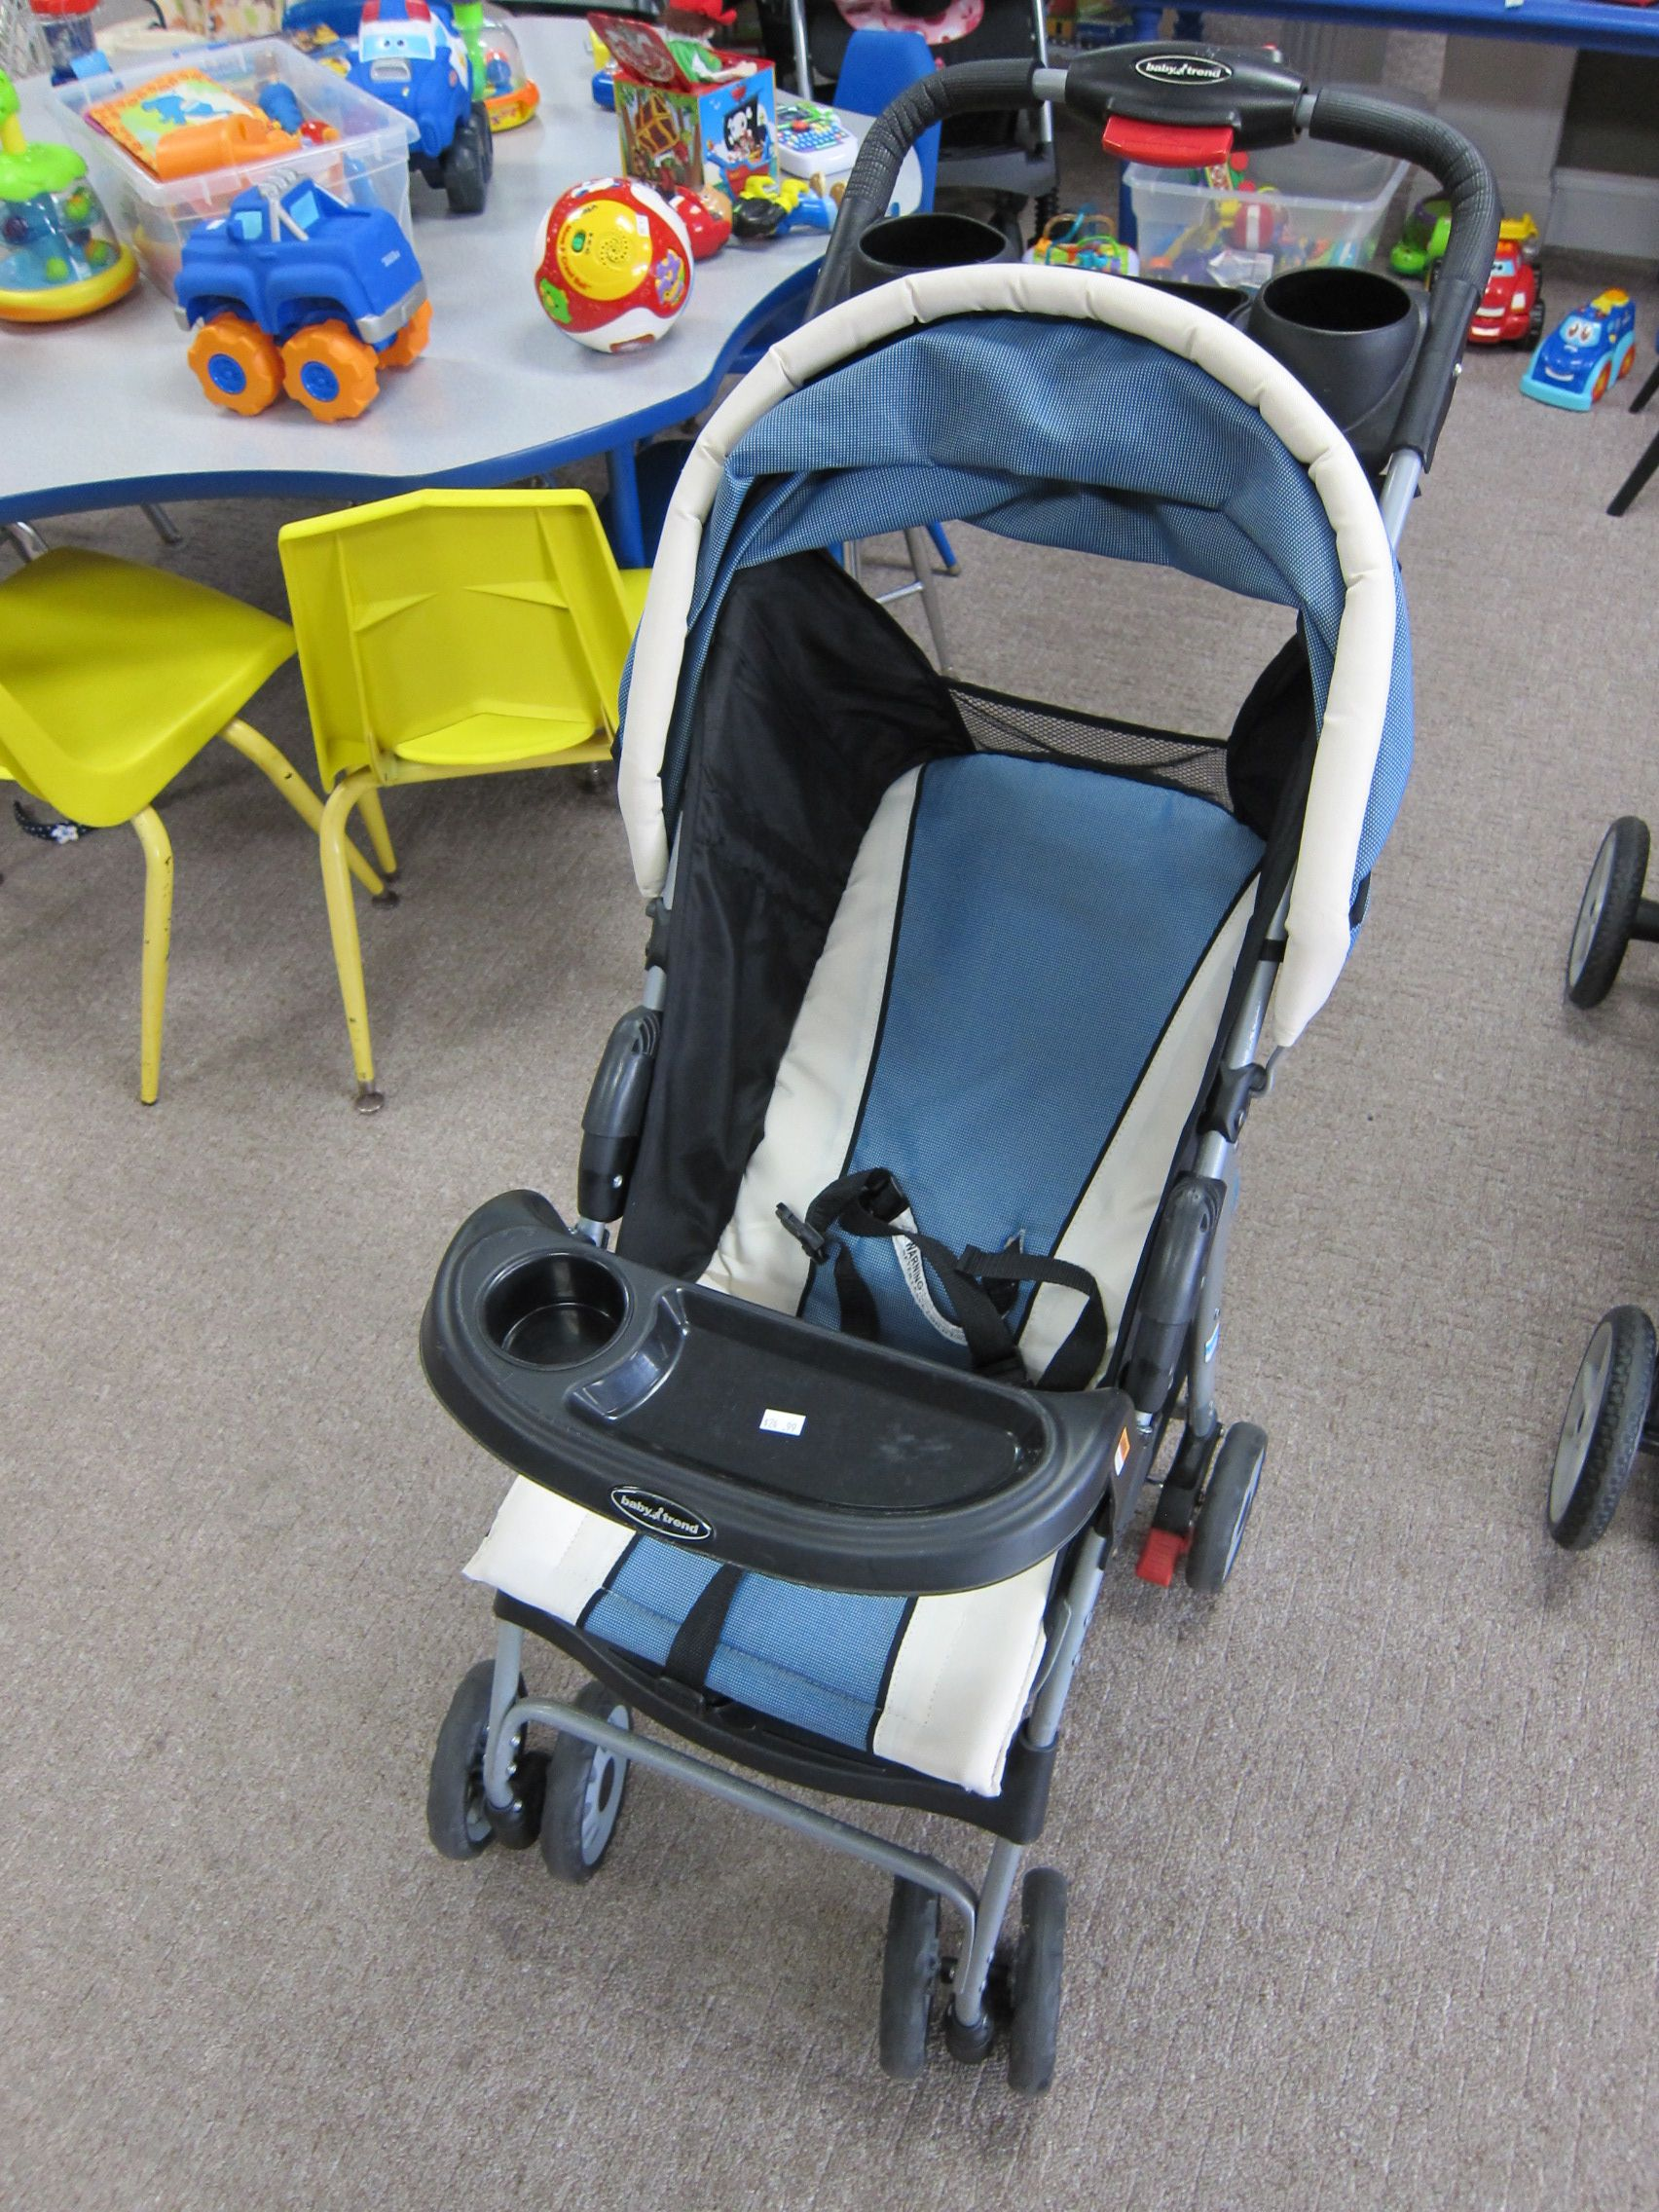 Baby Trend stroller 24.99 Baby trend stroller, Baby trend